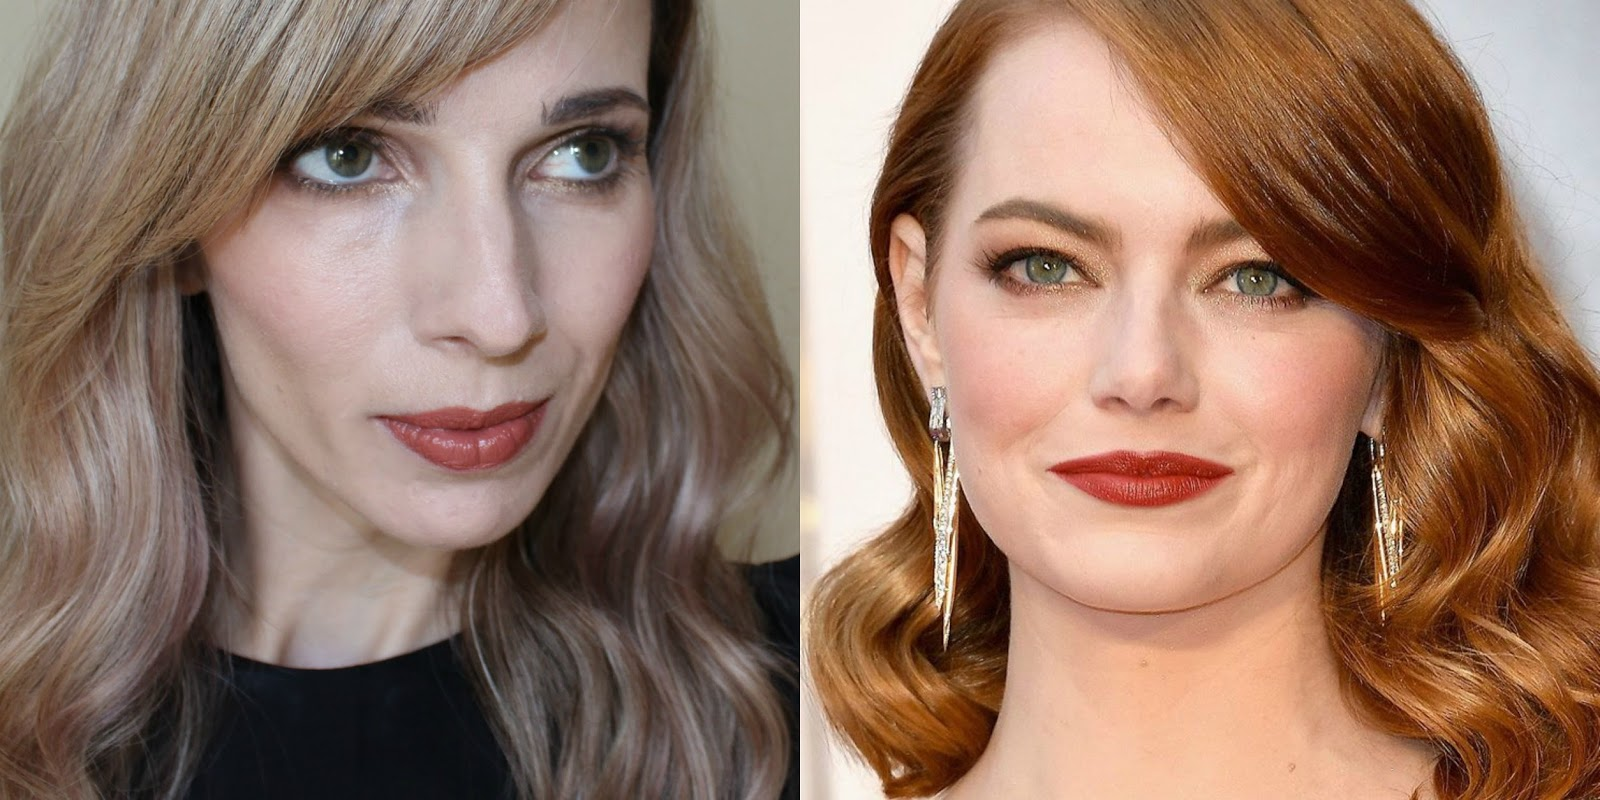 Emma Stone Oscars Inspired Makeup Look - 10